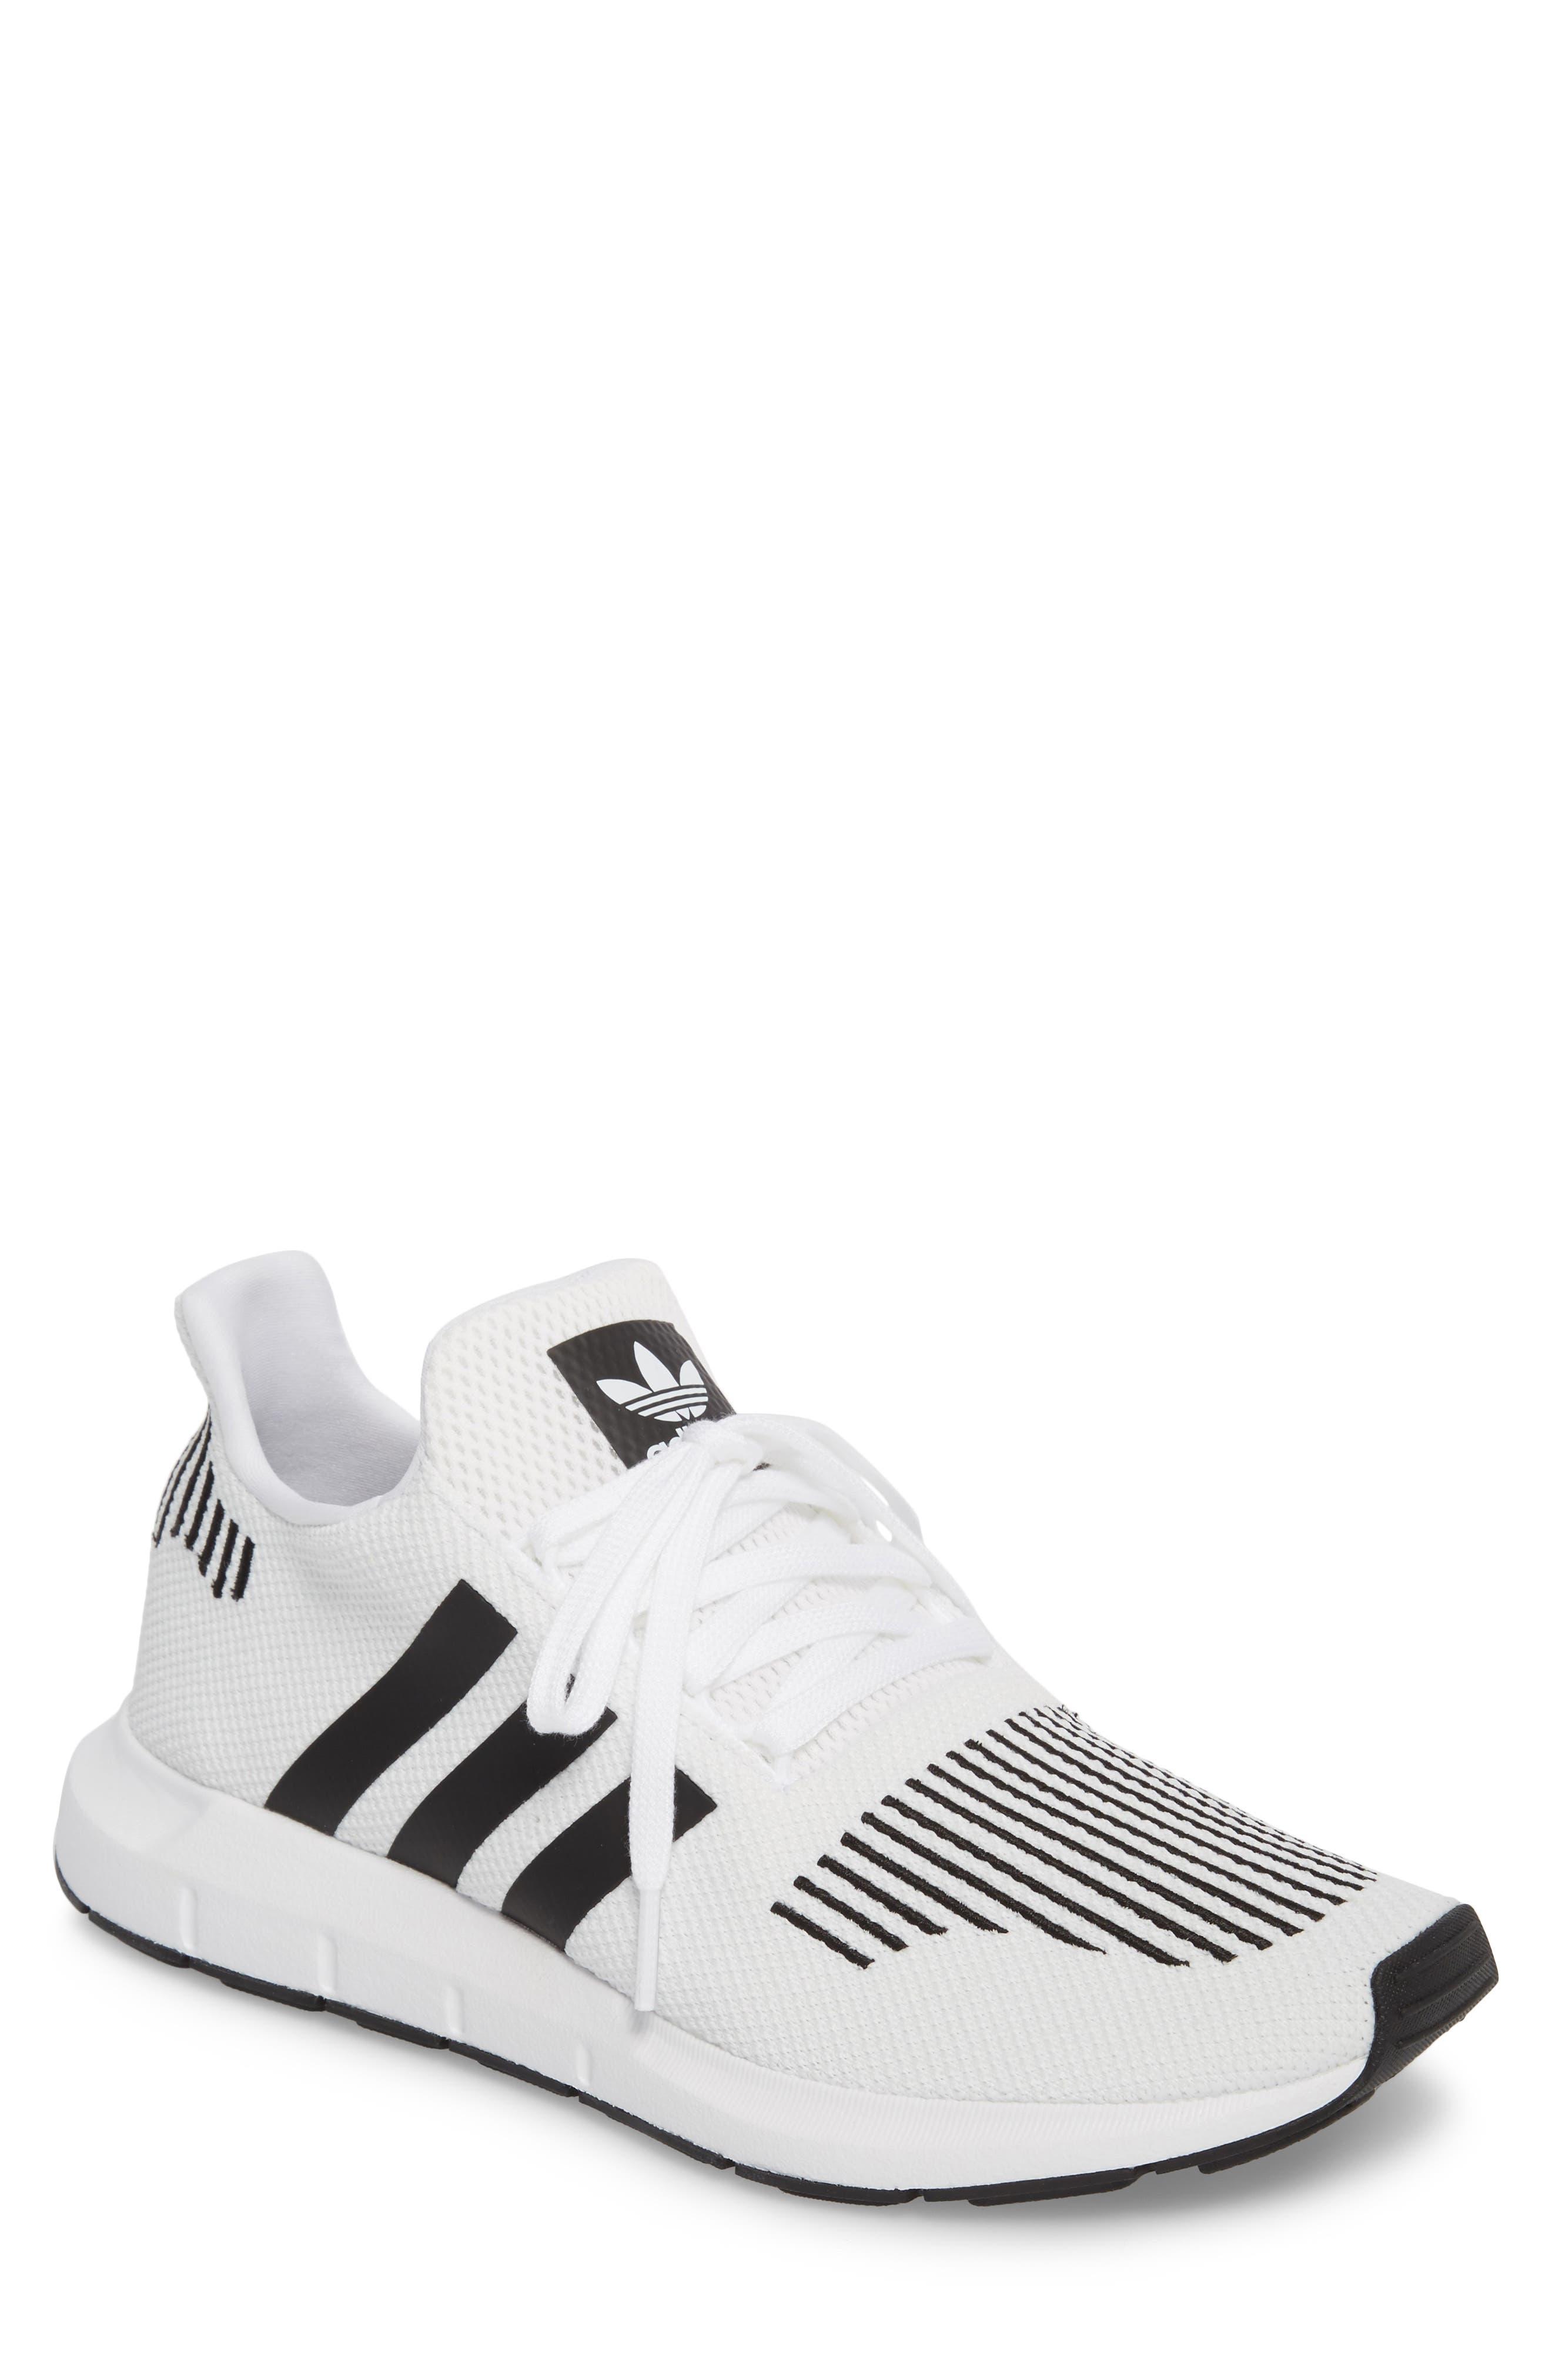 Swift Run Sneaker,                             Main thumbnail 1, color,                             White/ Core Black/ Grey